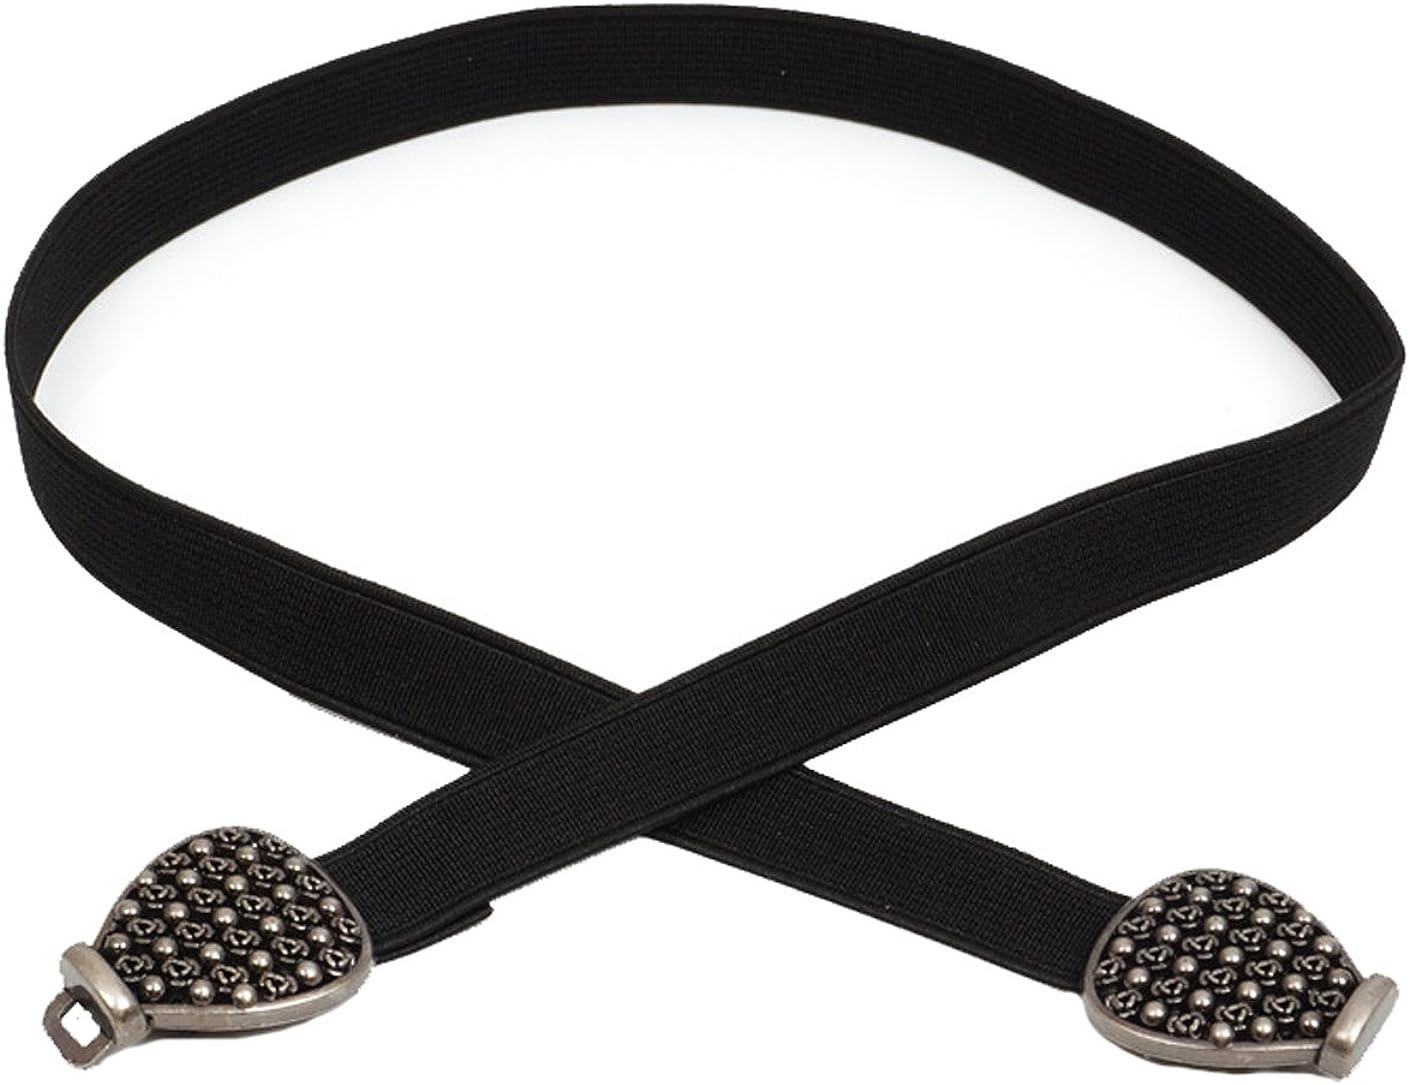 BAIMIL Ladies Metal Buckle Flower Thin Belt Elastic Belt Skirt Girdle Black